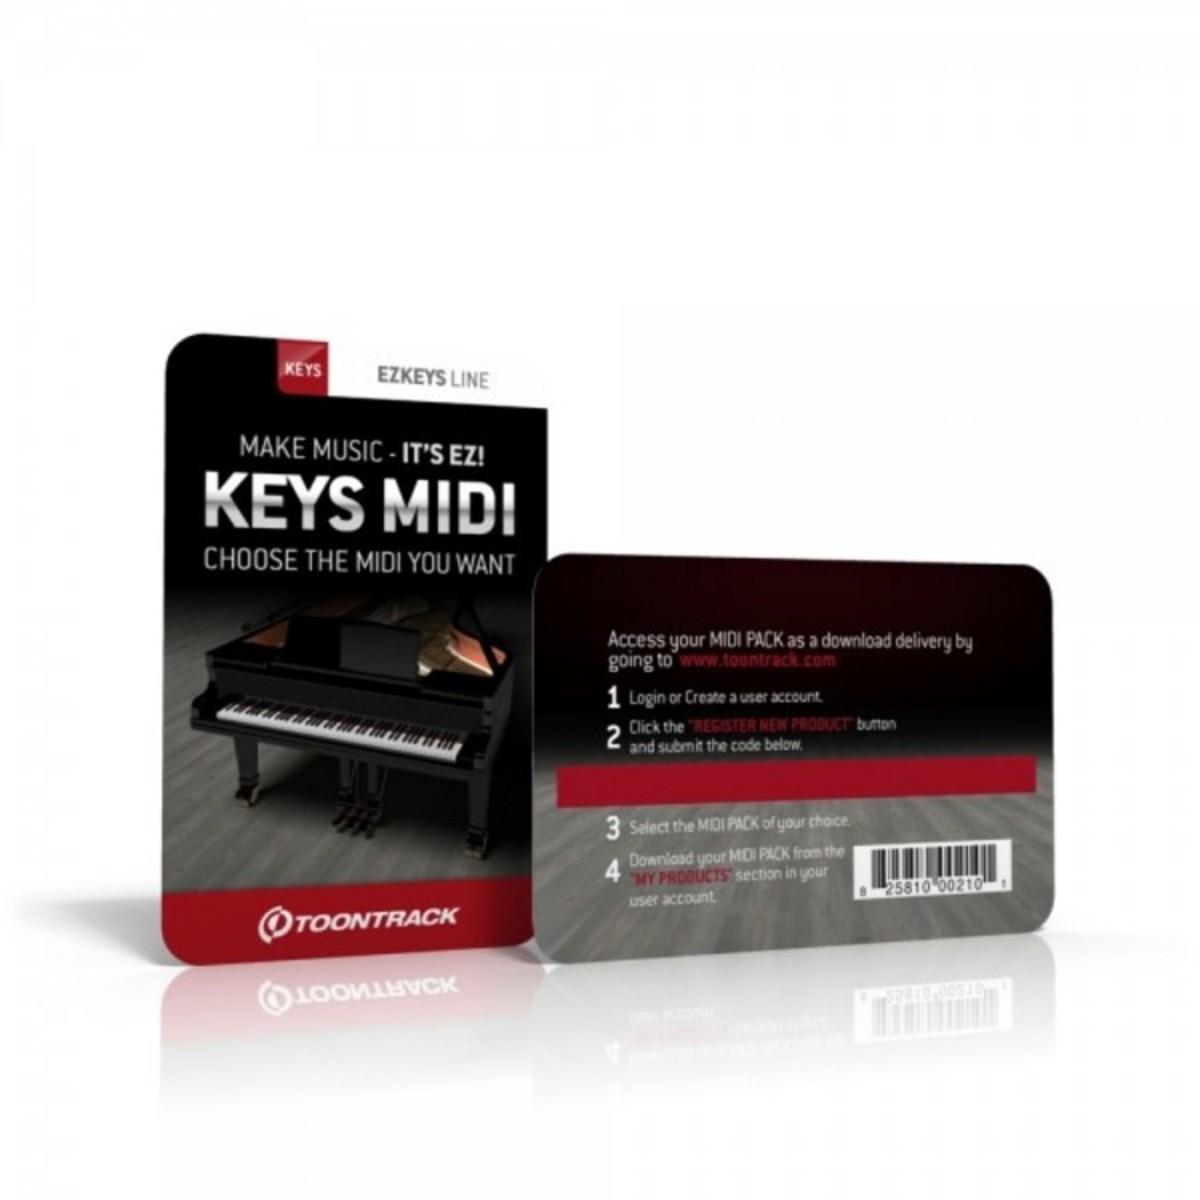 toontrack ezkeys generic midi pack serial number card at. Black Bedroom Furniture Sets. Home Design Ideas